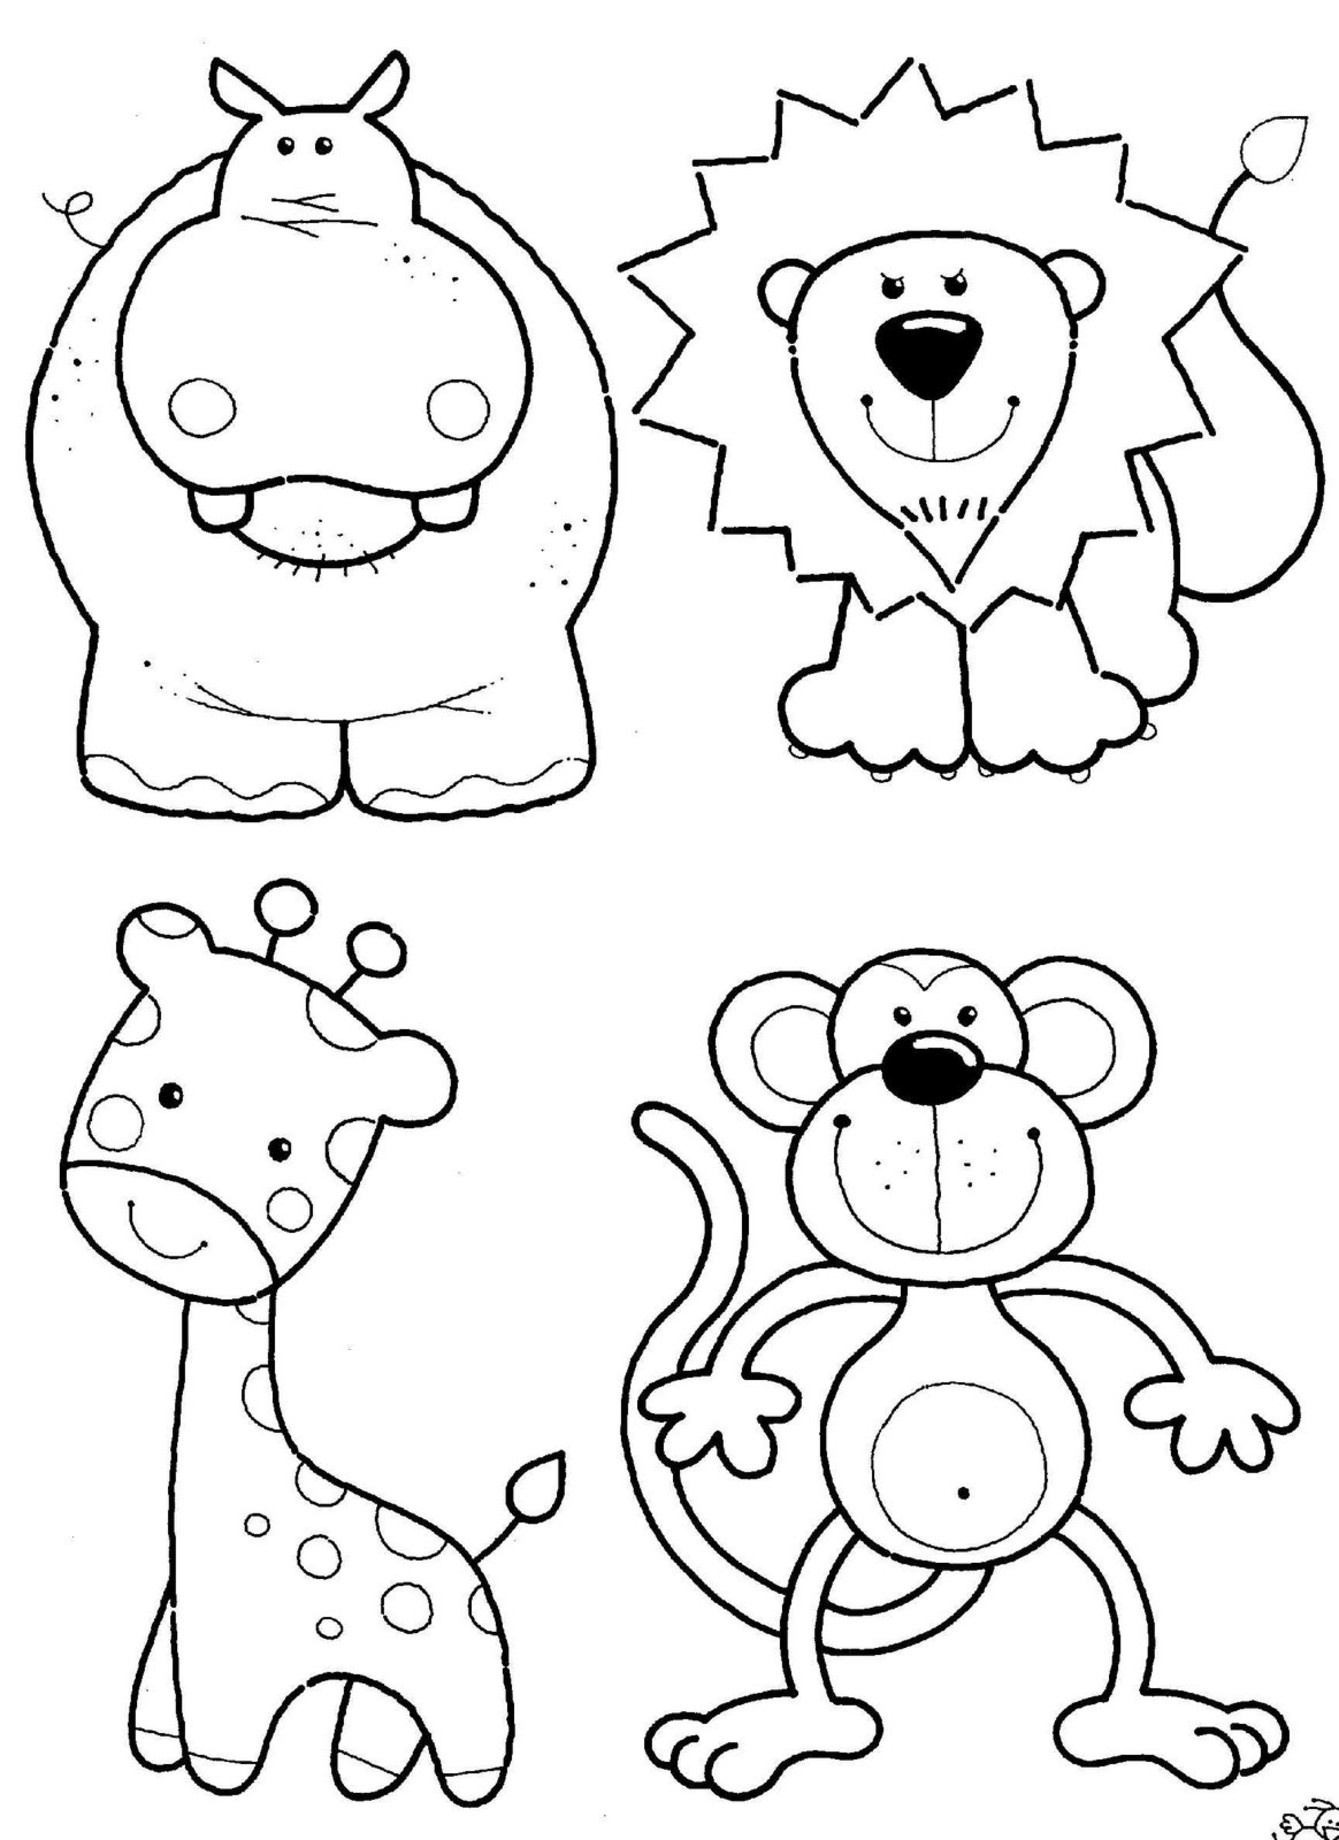 Coloring Ideas : Dt9Rgaagc Free Coloring Pictures Of Animals Ideas - Free Coloring Pages Animals Printable